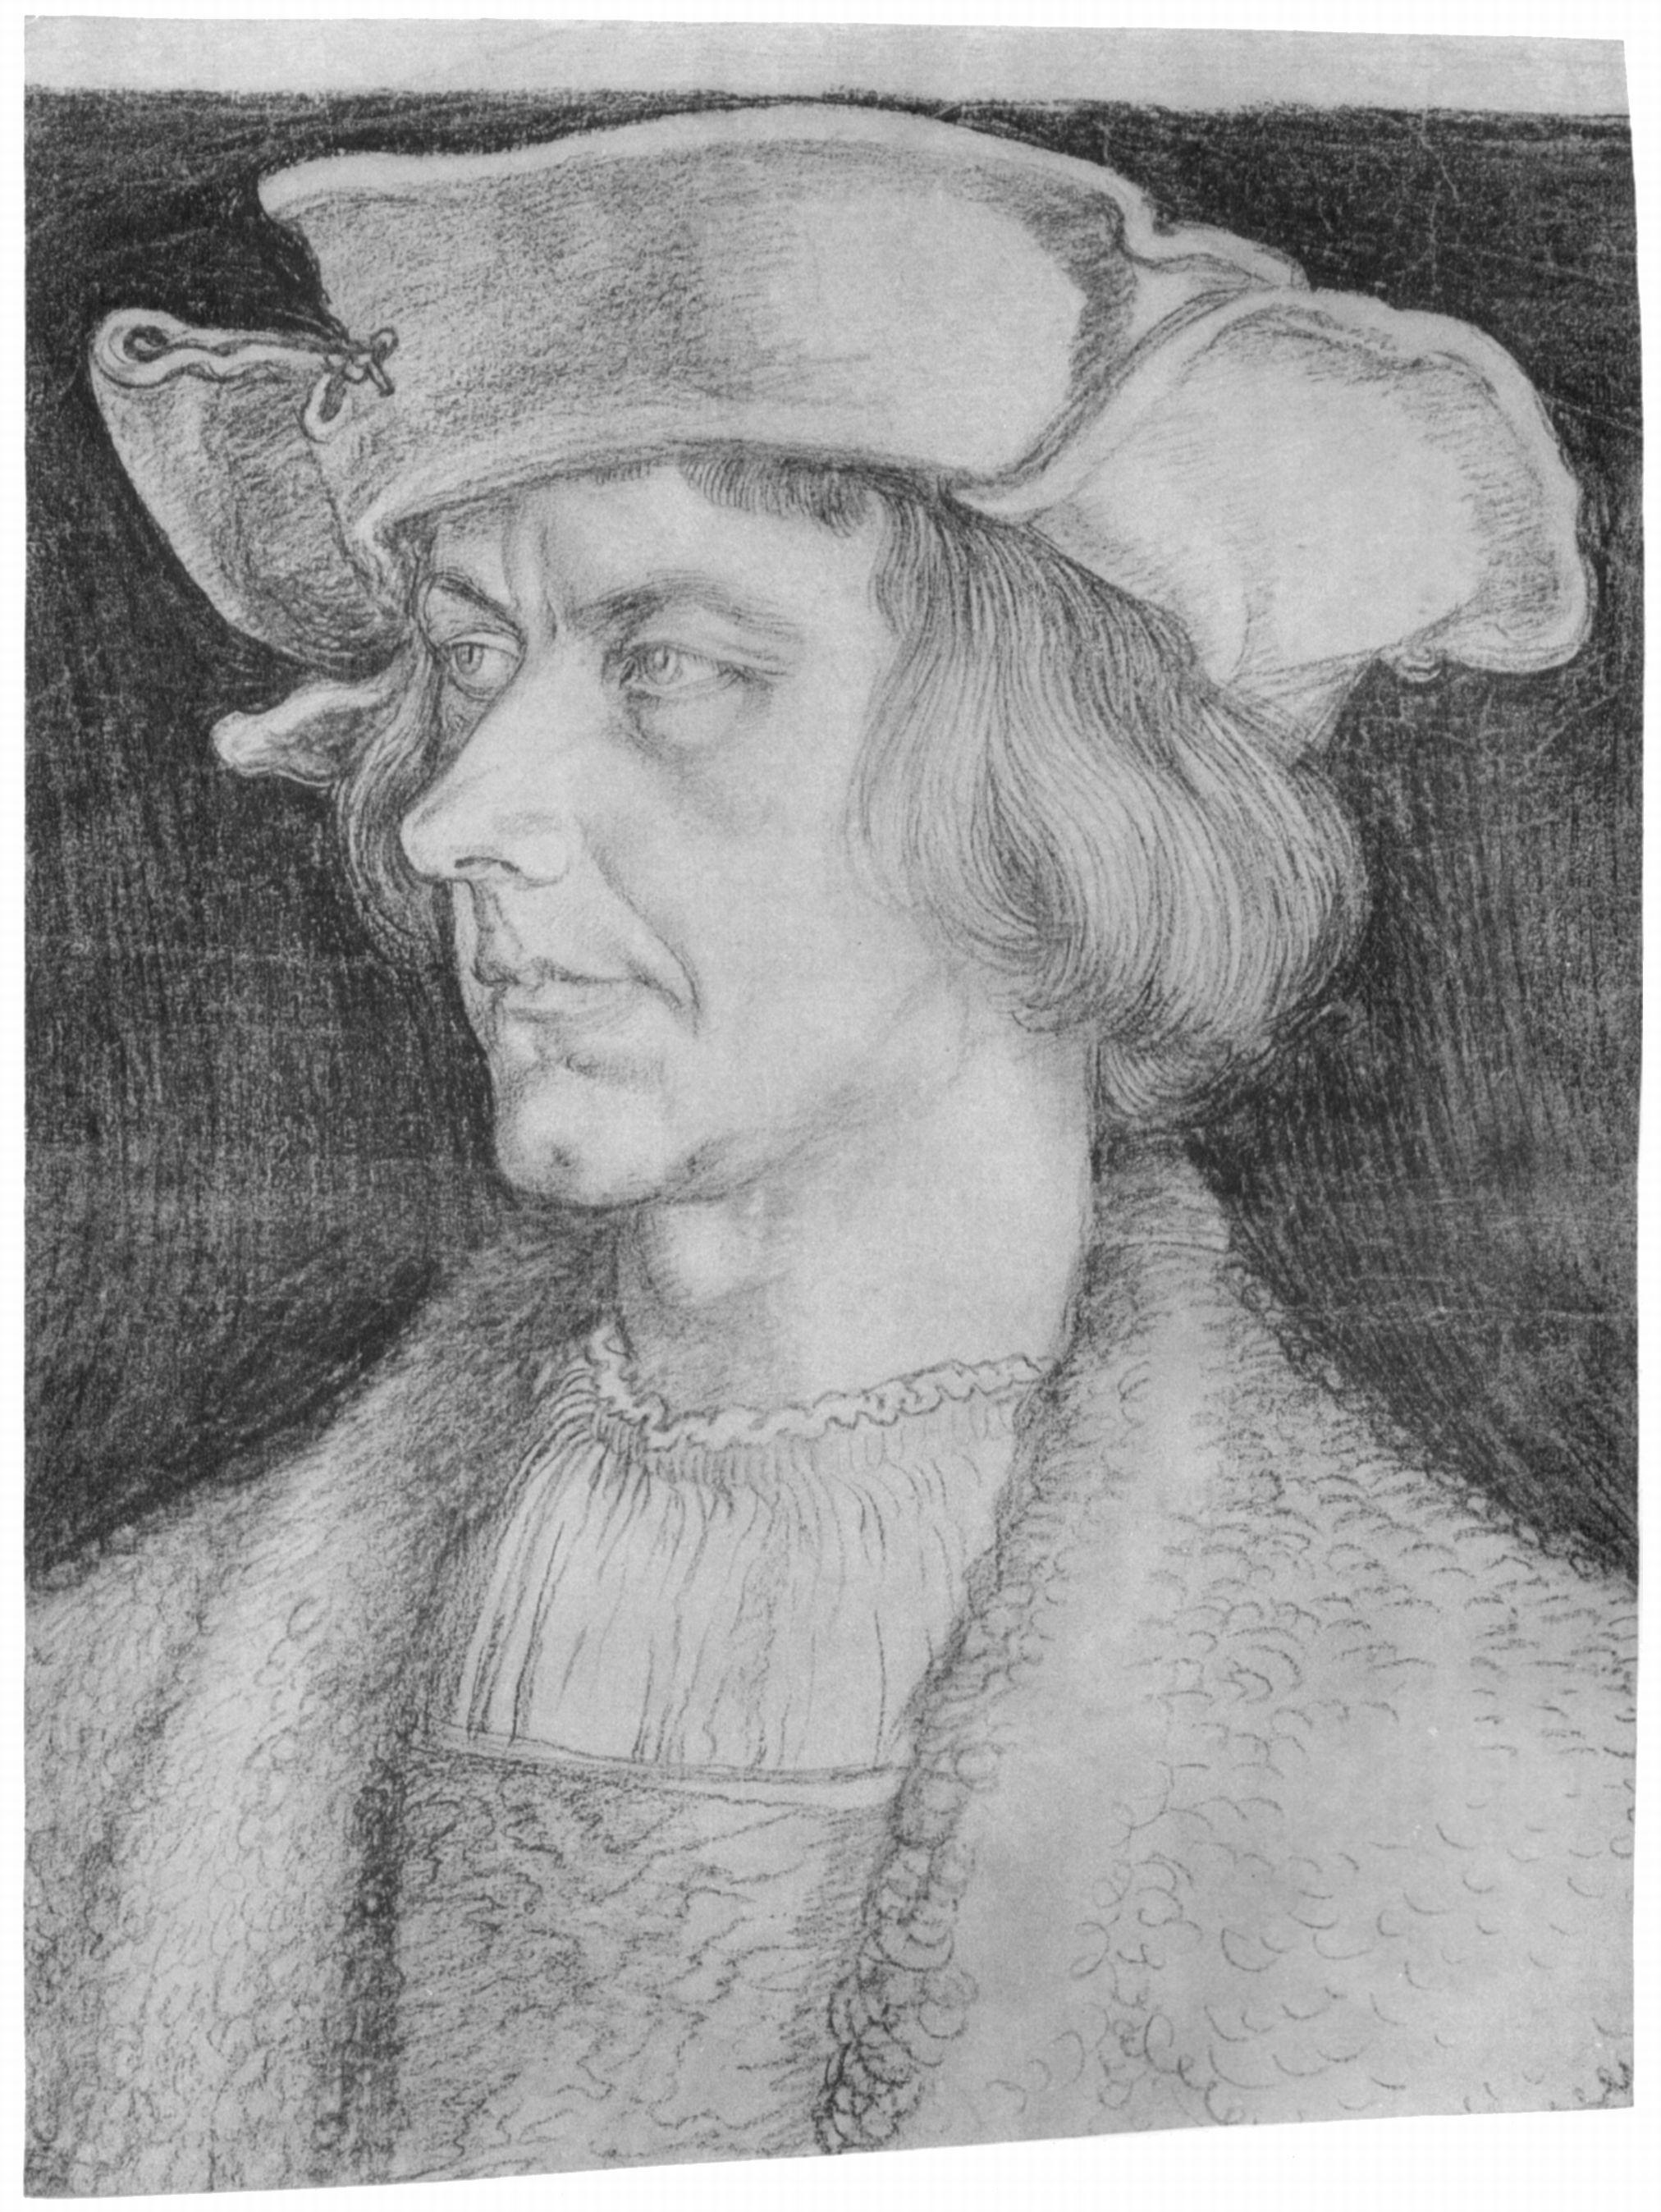 portrait-of-a-man-paul-hofhaimer-or-hans